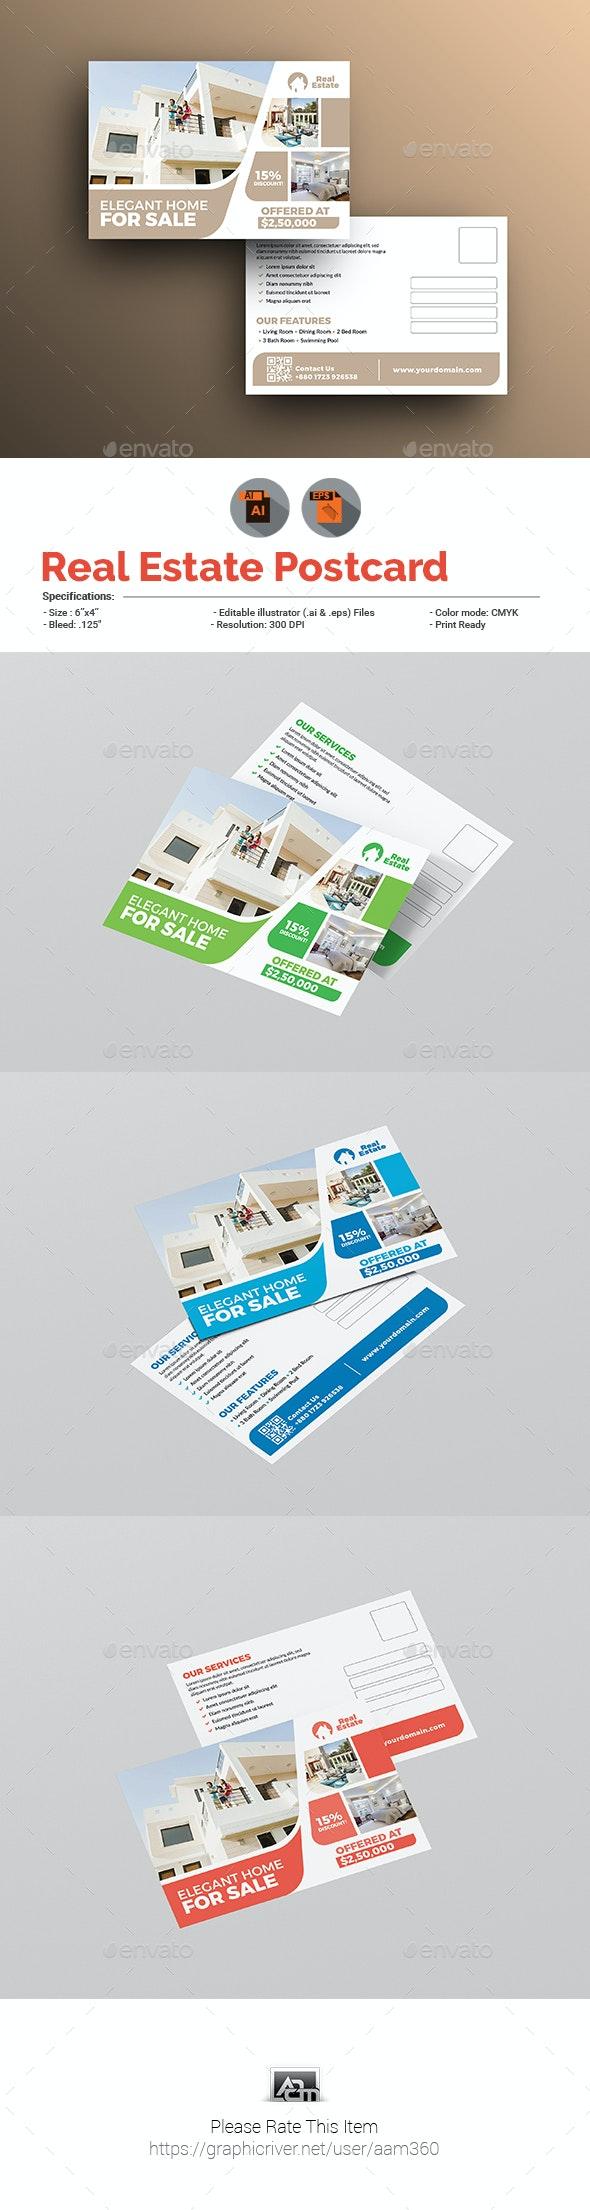 Real Estate Postcard Template - Cards & Invites Print Templates